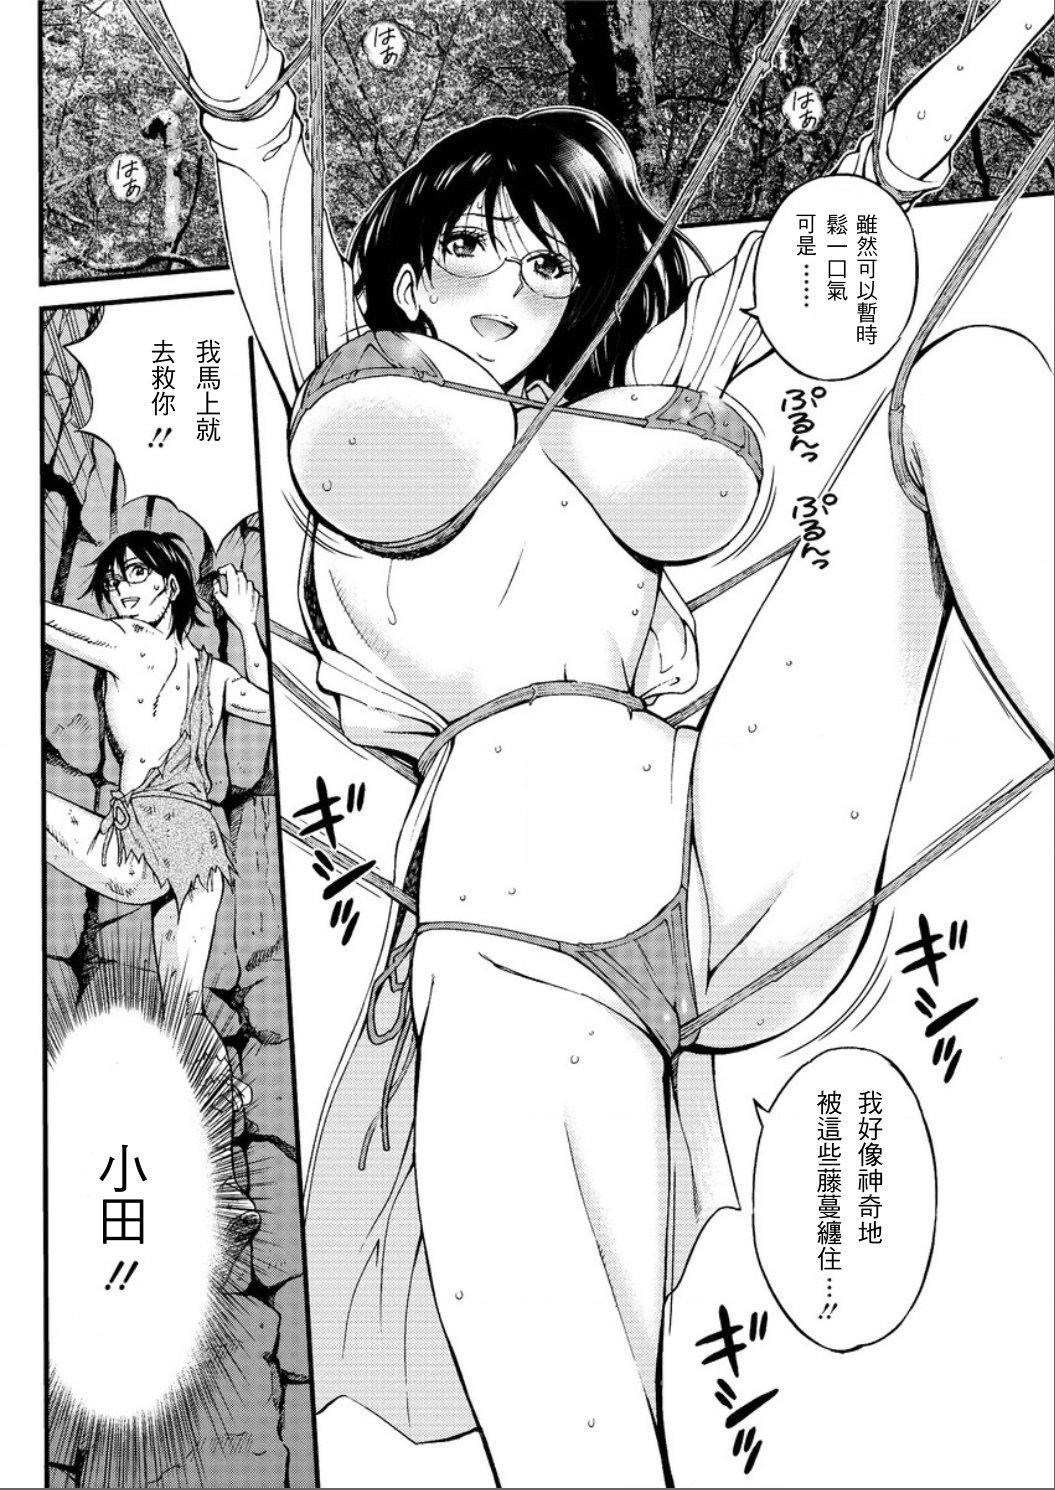 Kigenzen 10000 Nen no Ota | 史前一萬年的宅男 Ch. 19-24 9